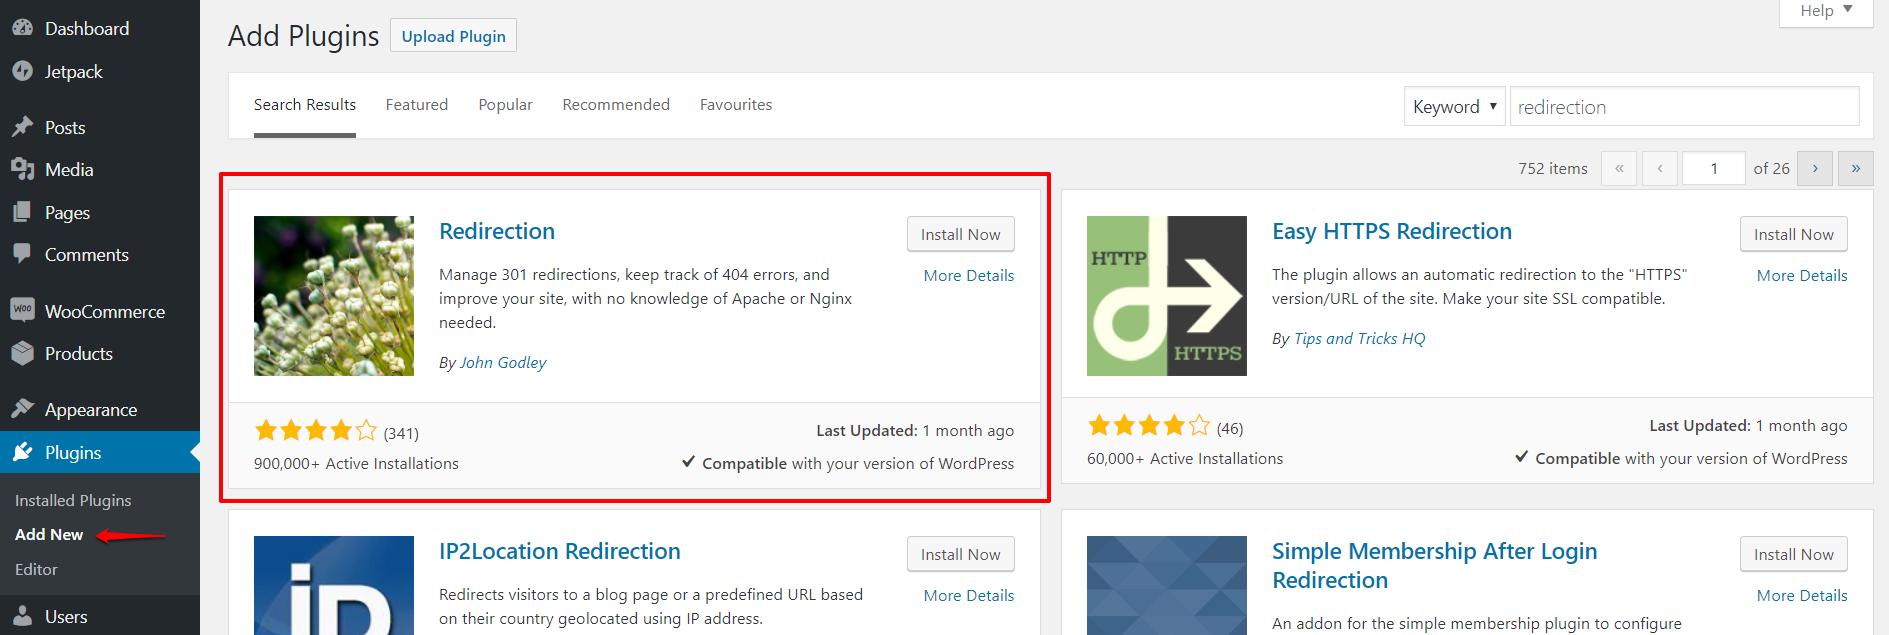 Redirection plugin for WordPress | HollyPryce.com